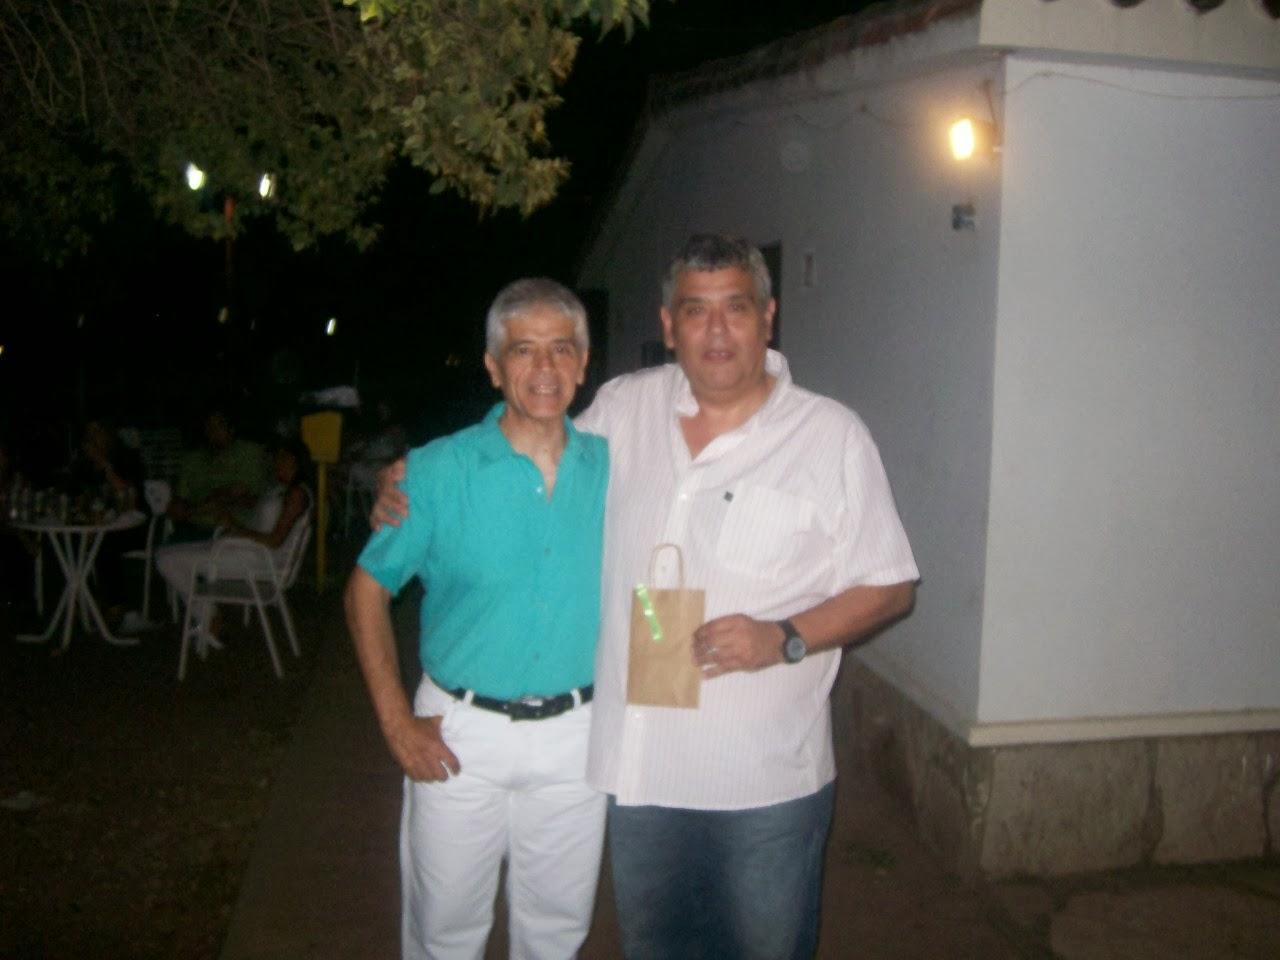 La Federación Cordobesa de Natación distinguió a Rubén Di Liddo